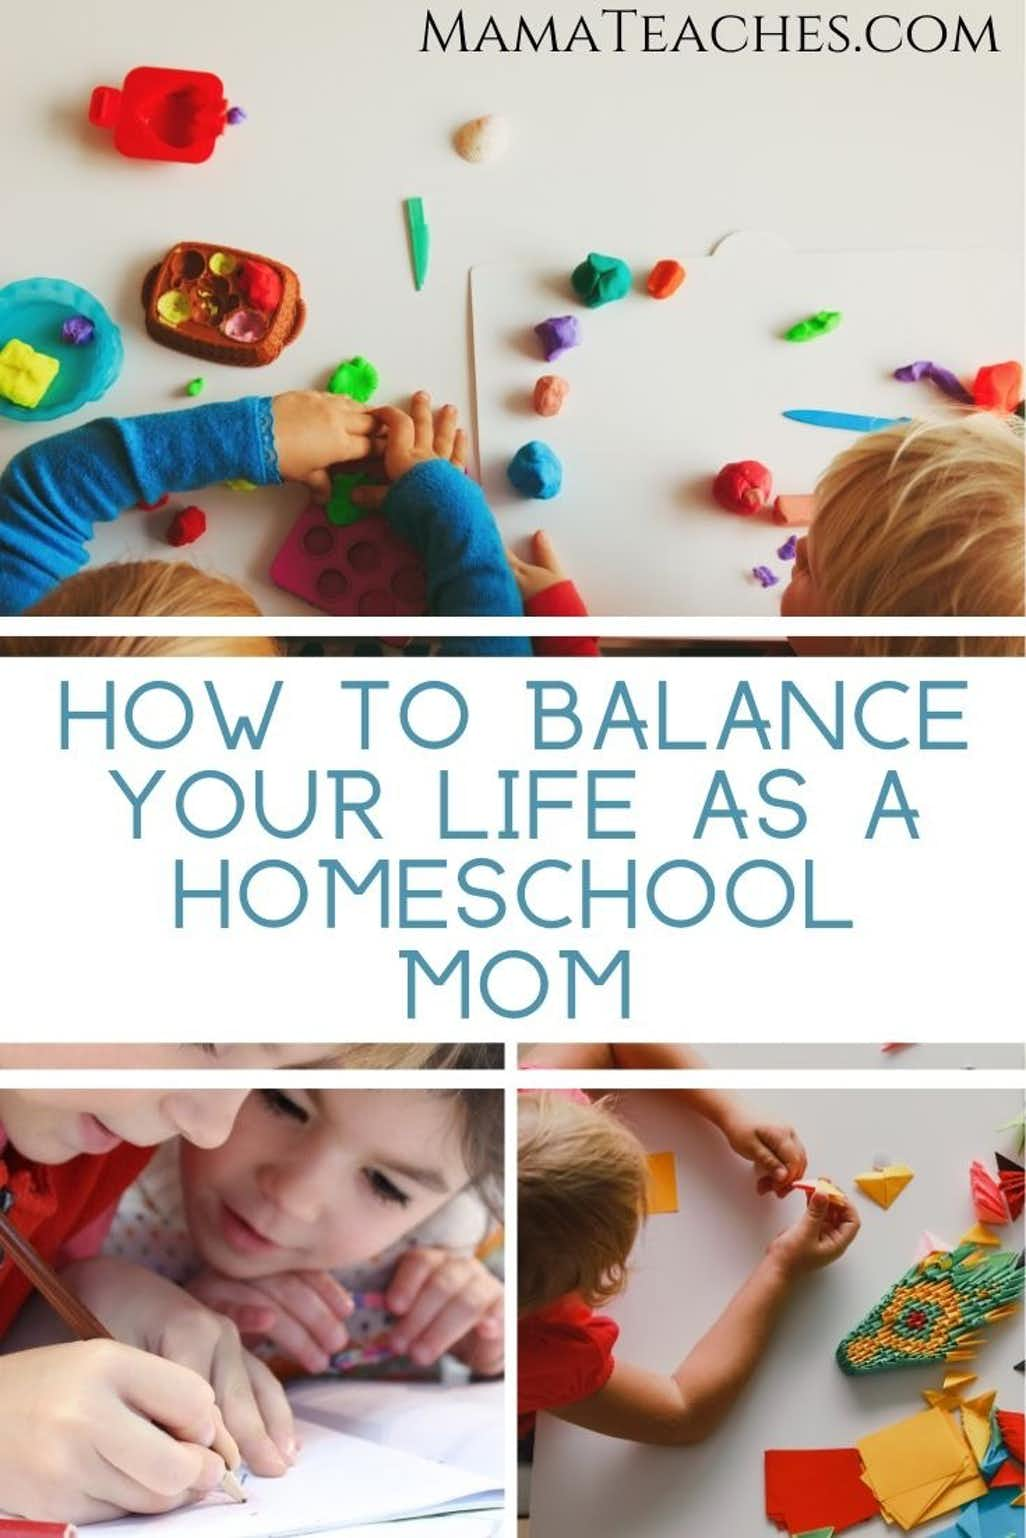 How to Balance Your Life as a Homeschool Mom